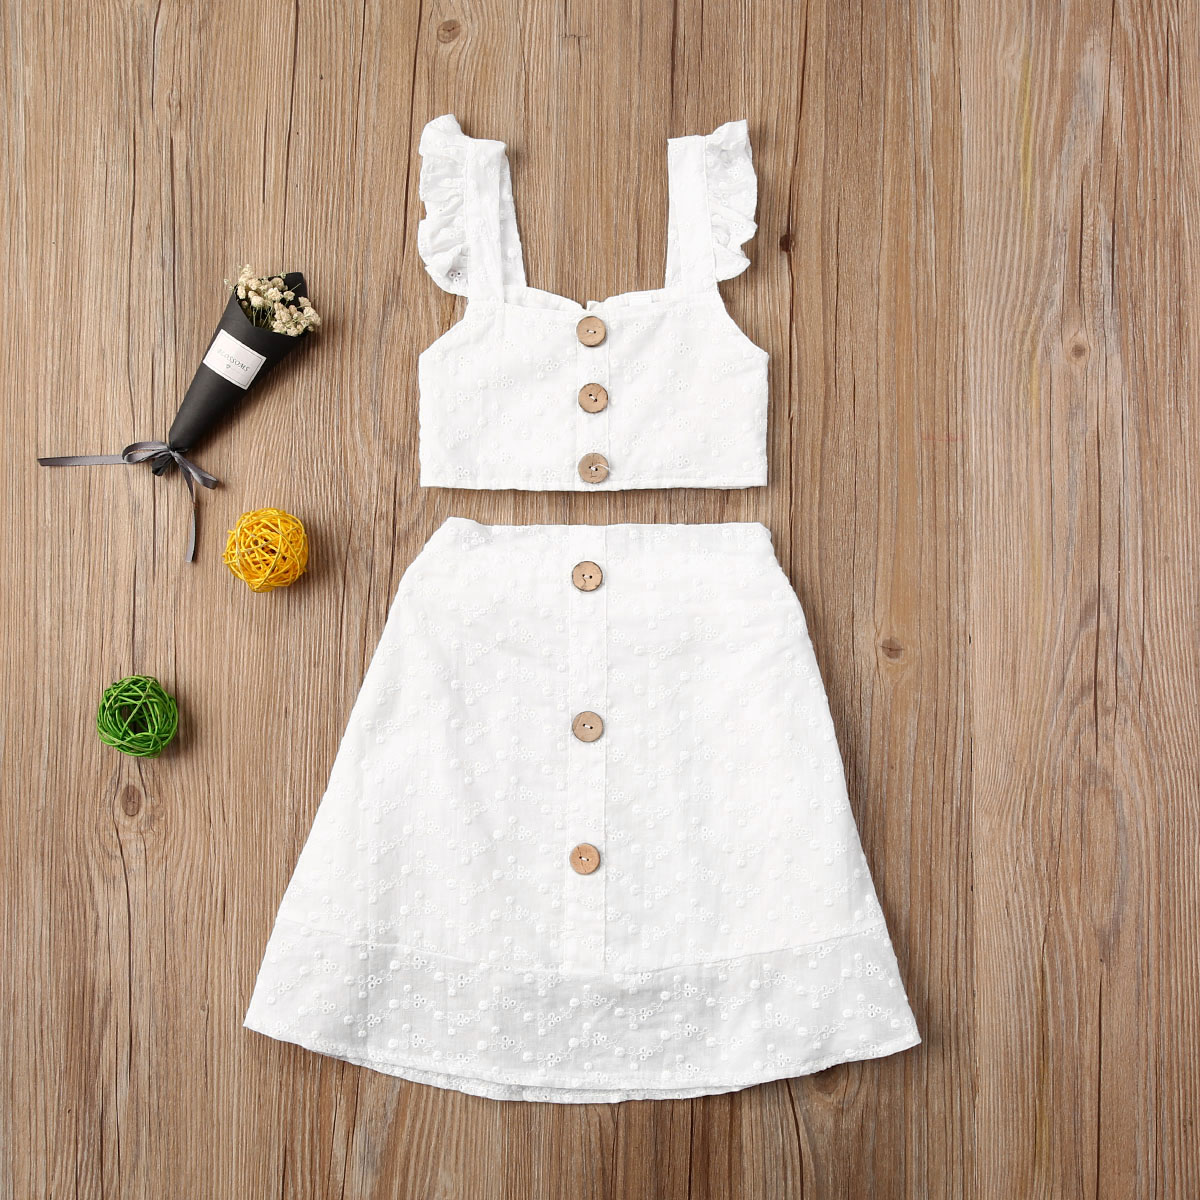 New Summer Kids Baby Girls 1T-6T Clothes Kids Sleeveless T-shirt Tops+Skirts Outfits Set